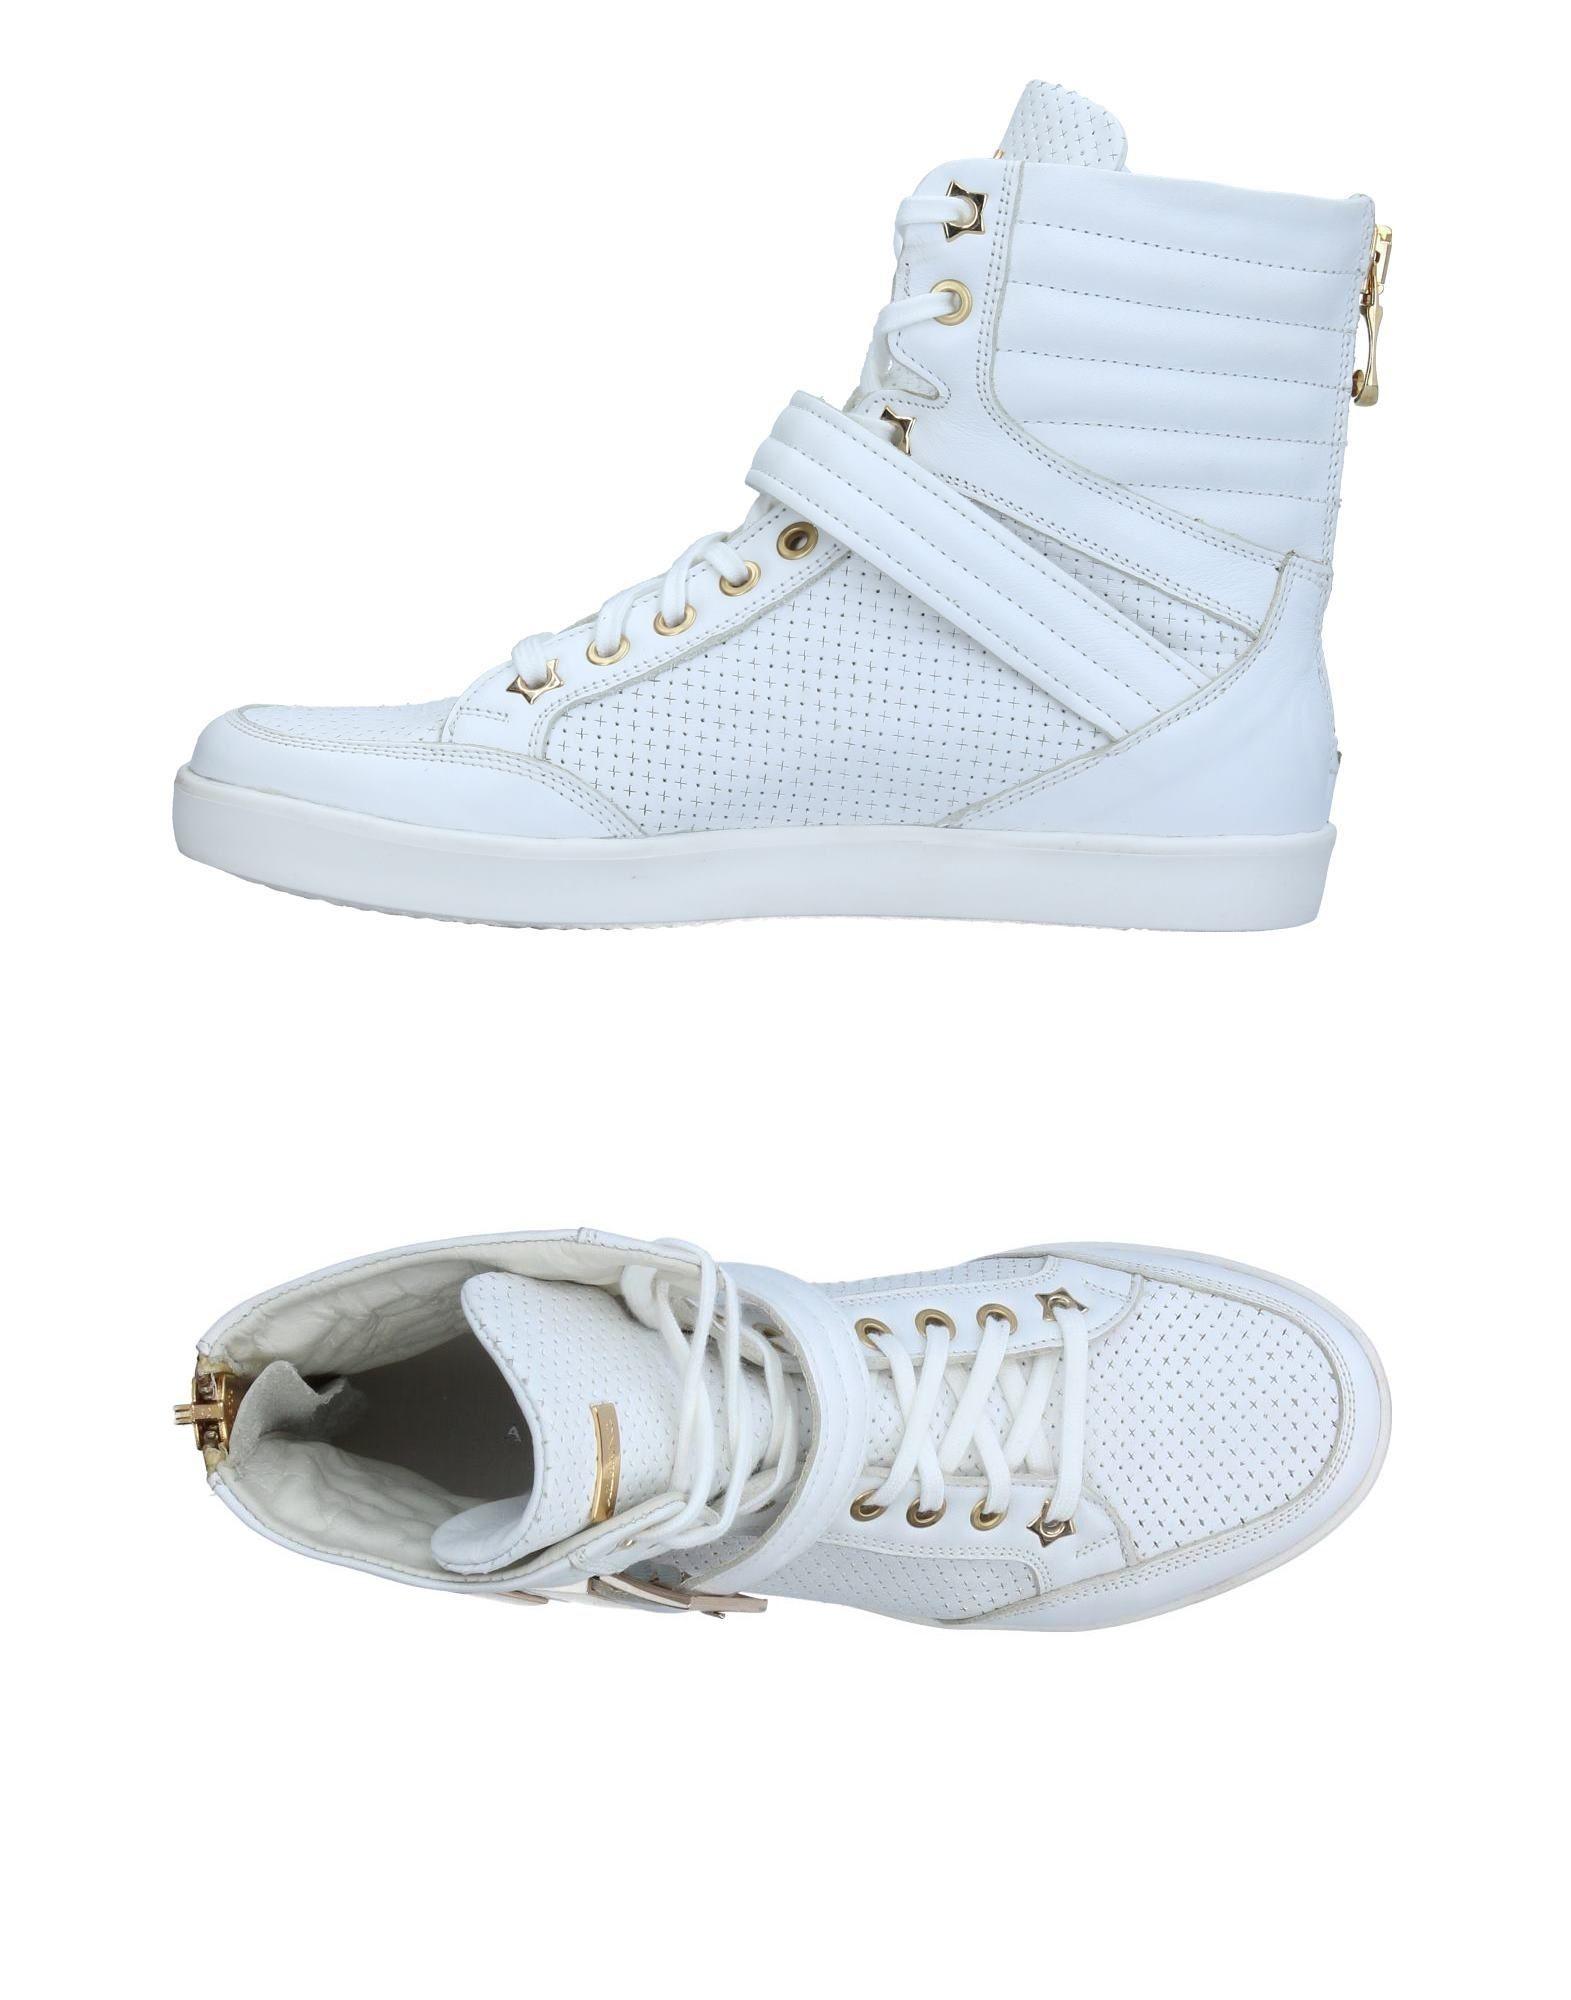 ALBANO Высокие кеды и кроссовки кеды кроссовки высокие dc council mid tx stone camo